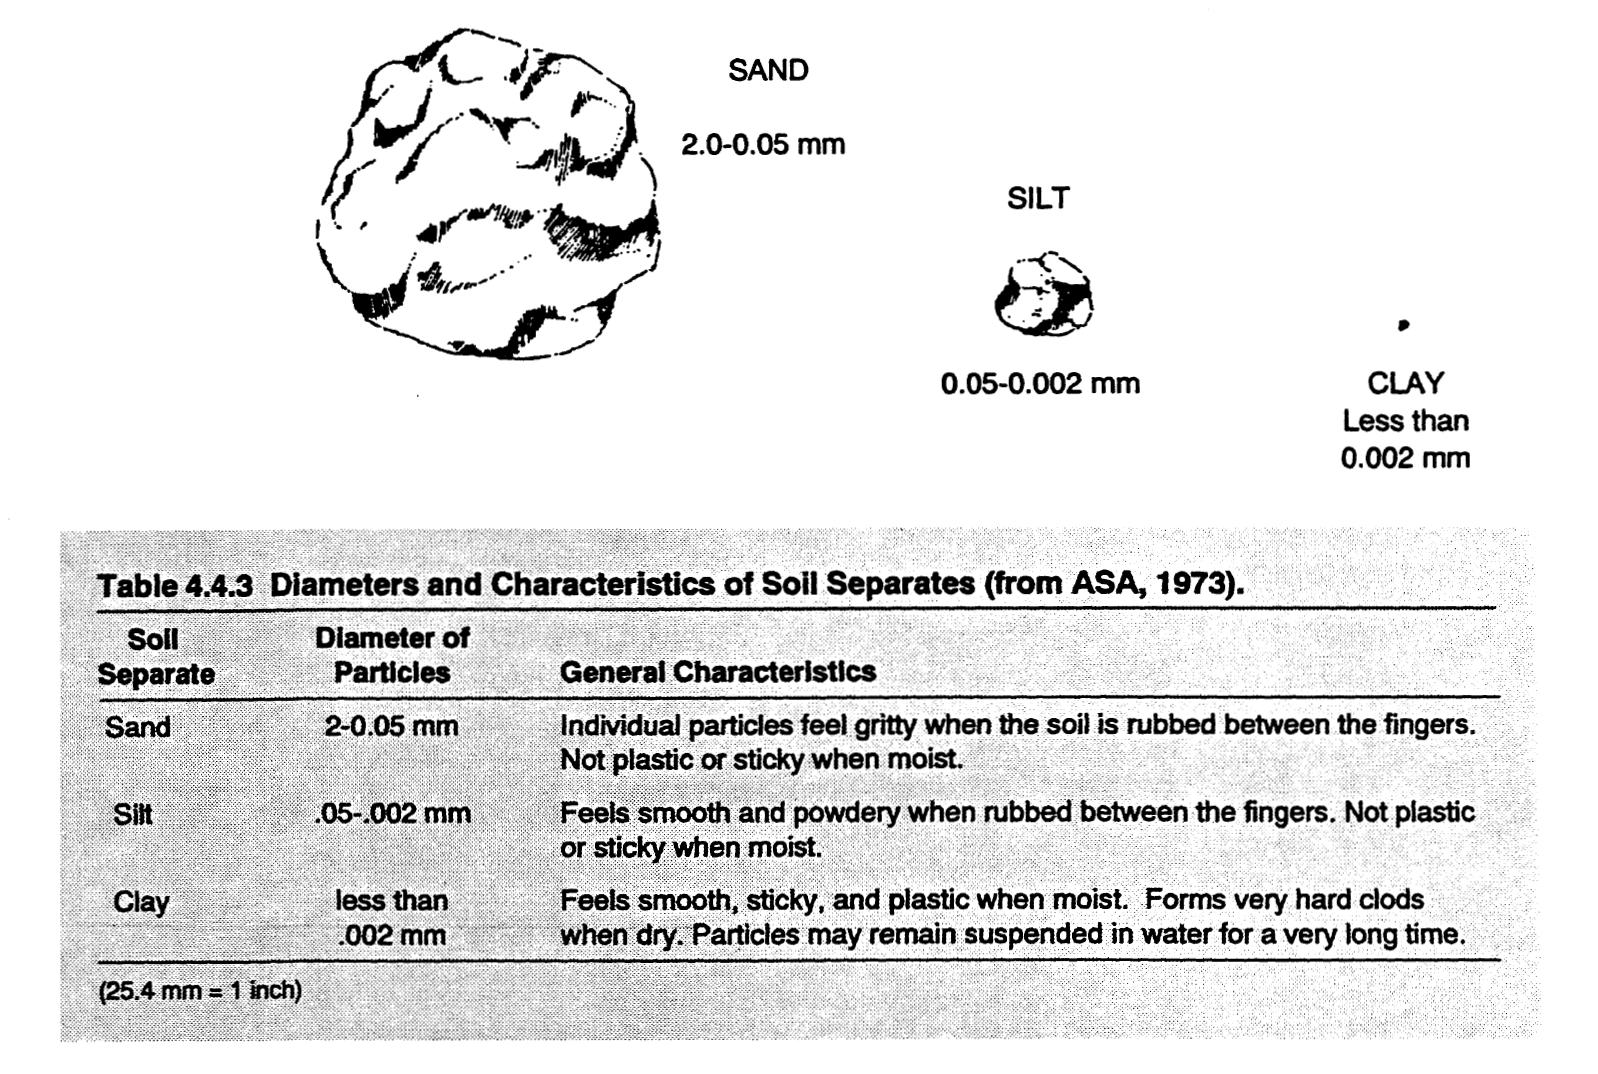 Diameters and Characteristics of Soil Separates